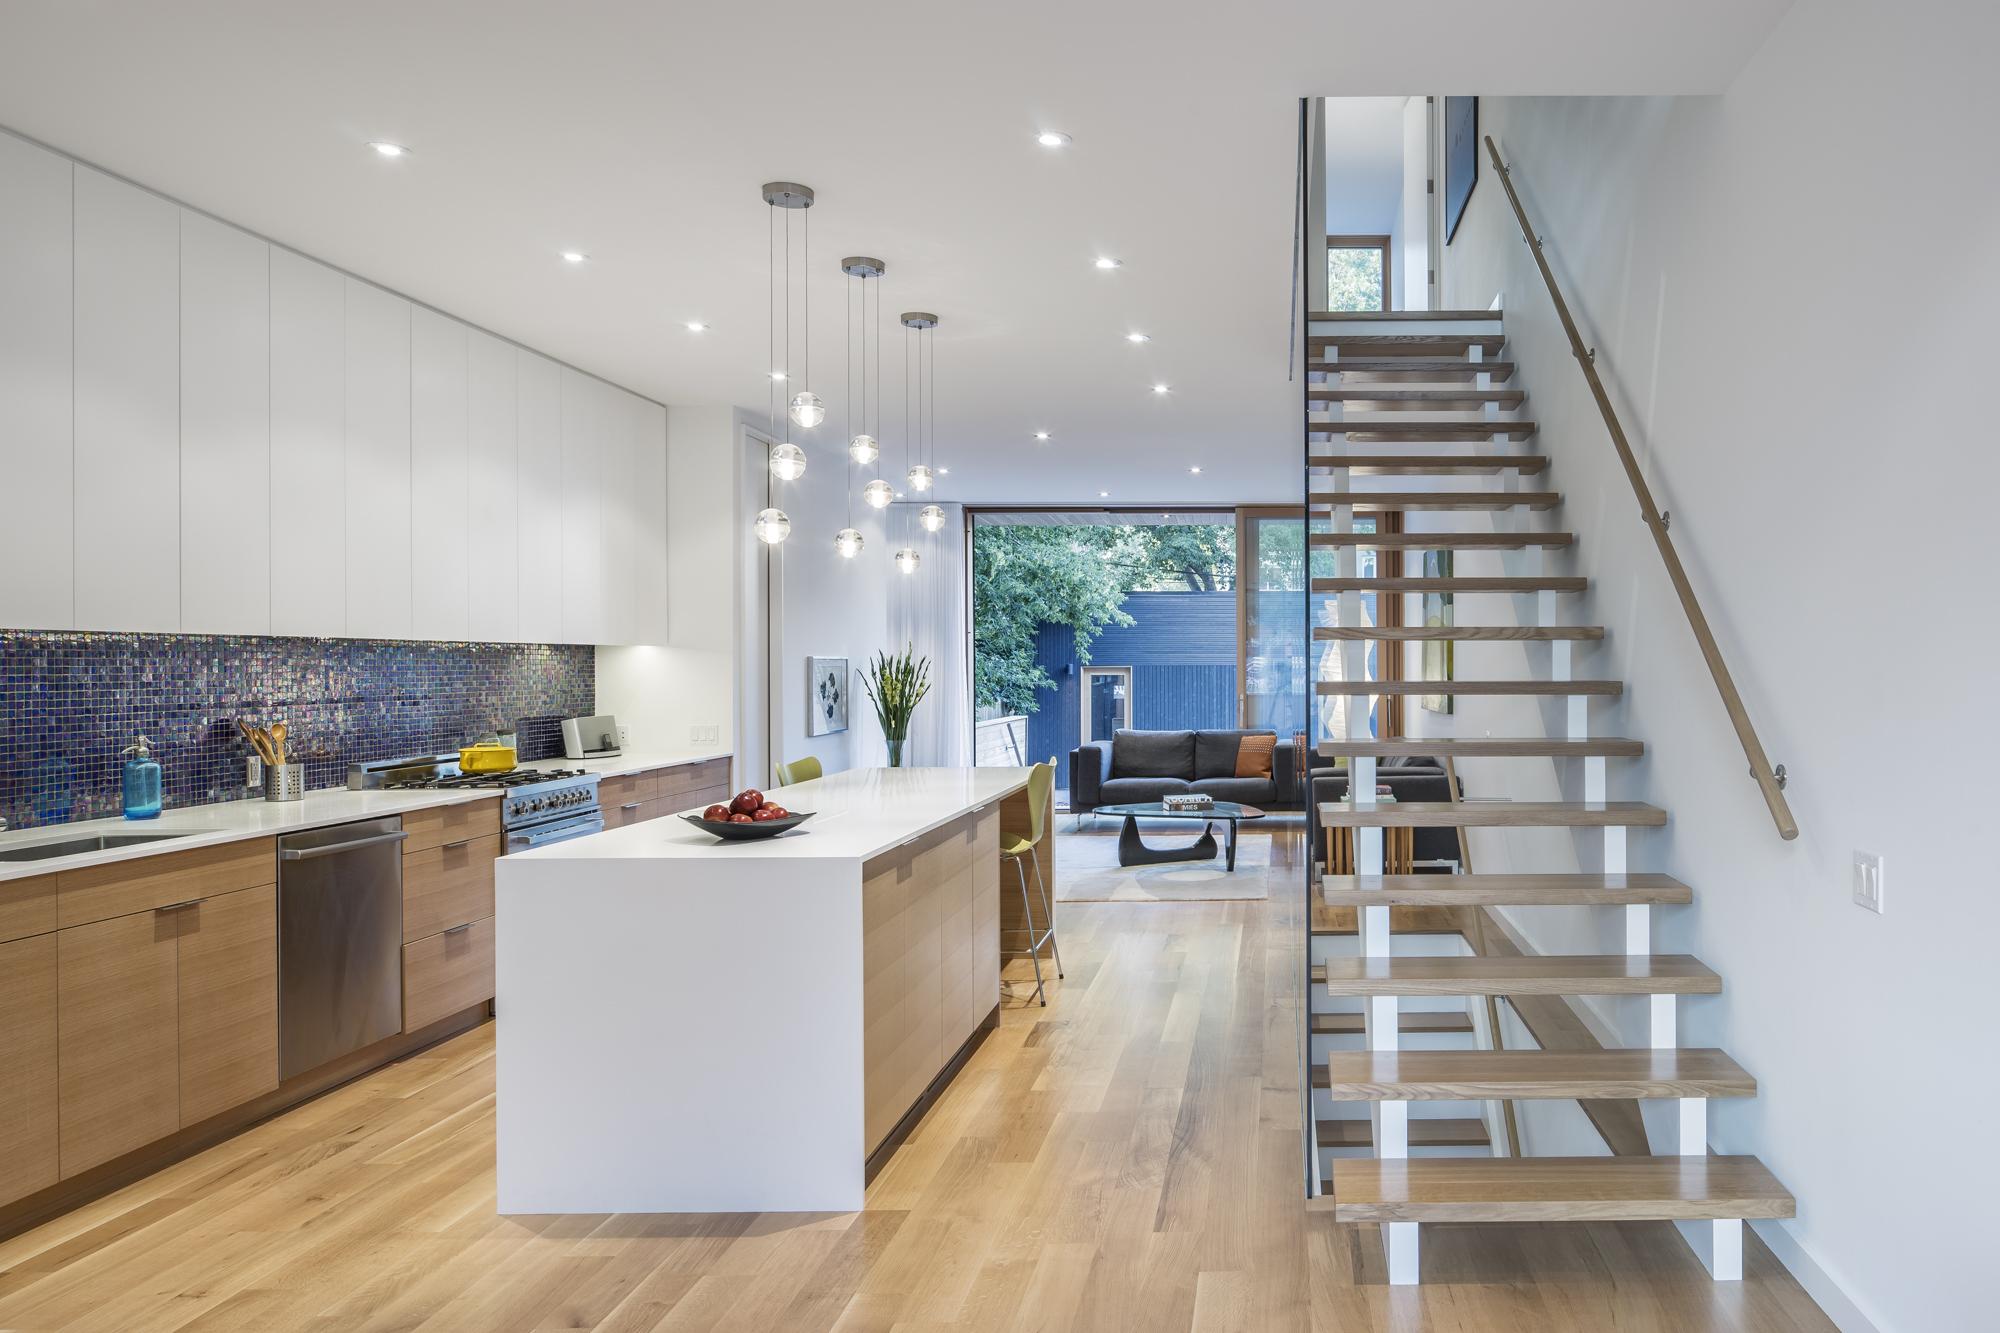 3 kitchen to living.jpg